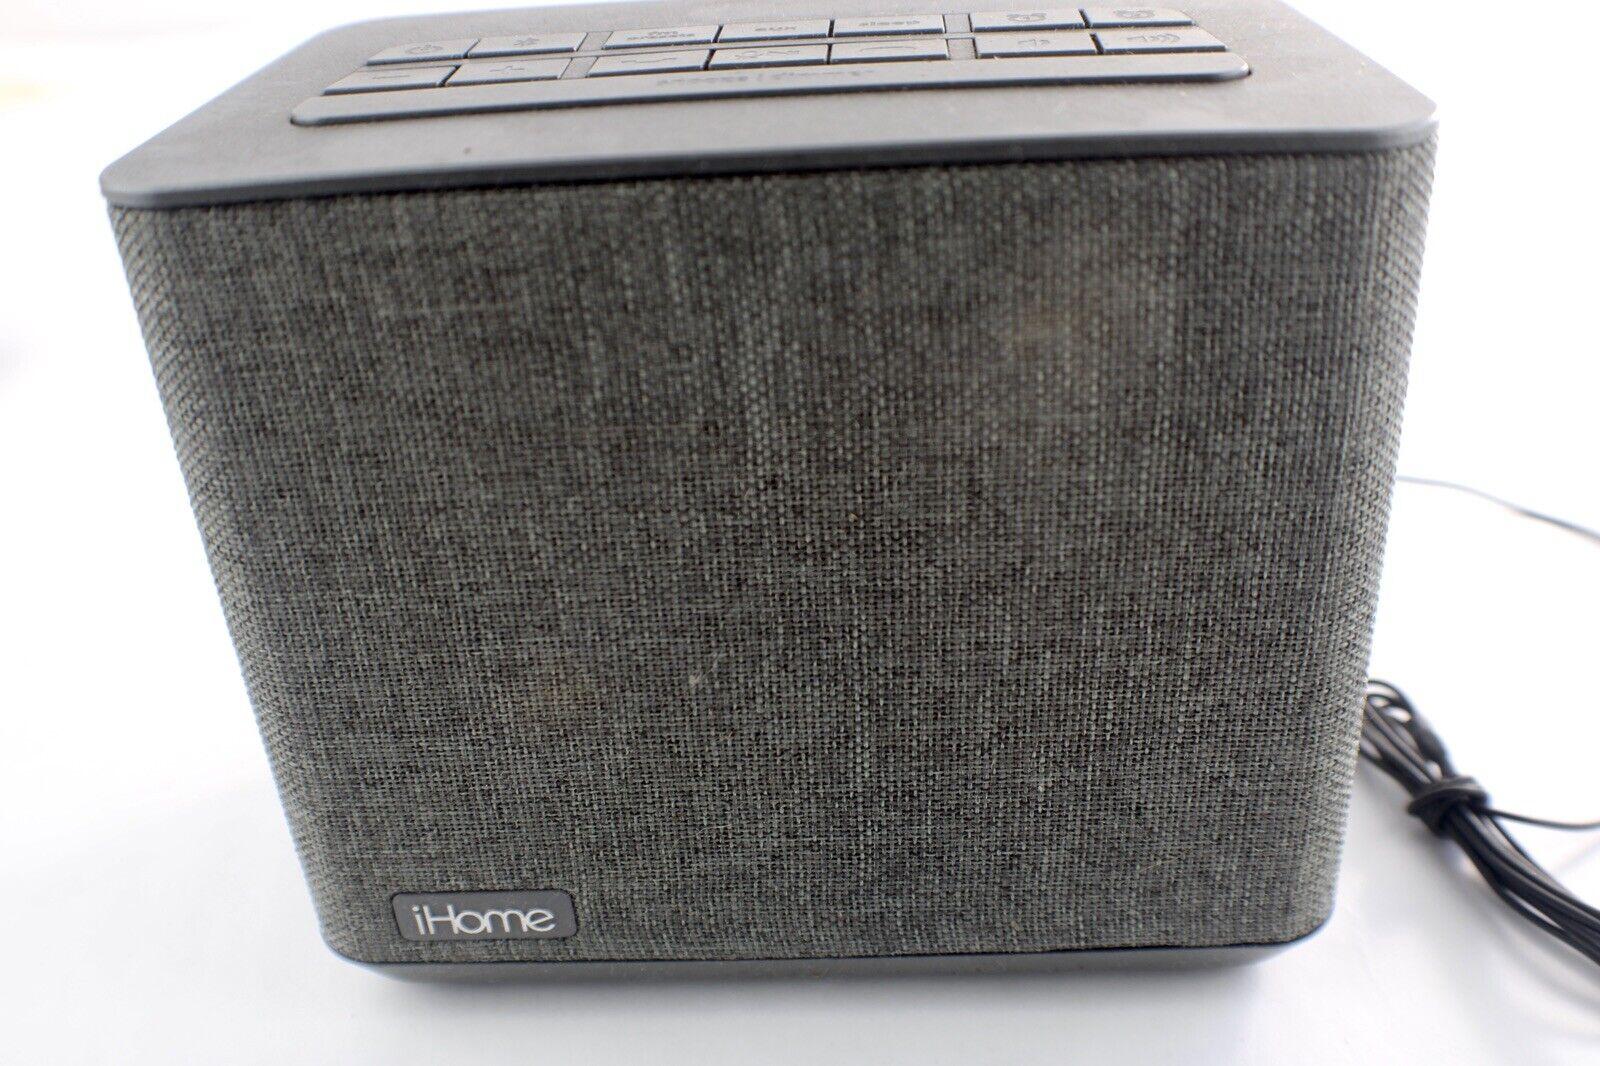 iHome Bluetooth Dual Alarm Clock Radio + USB Charging - iBT232